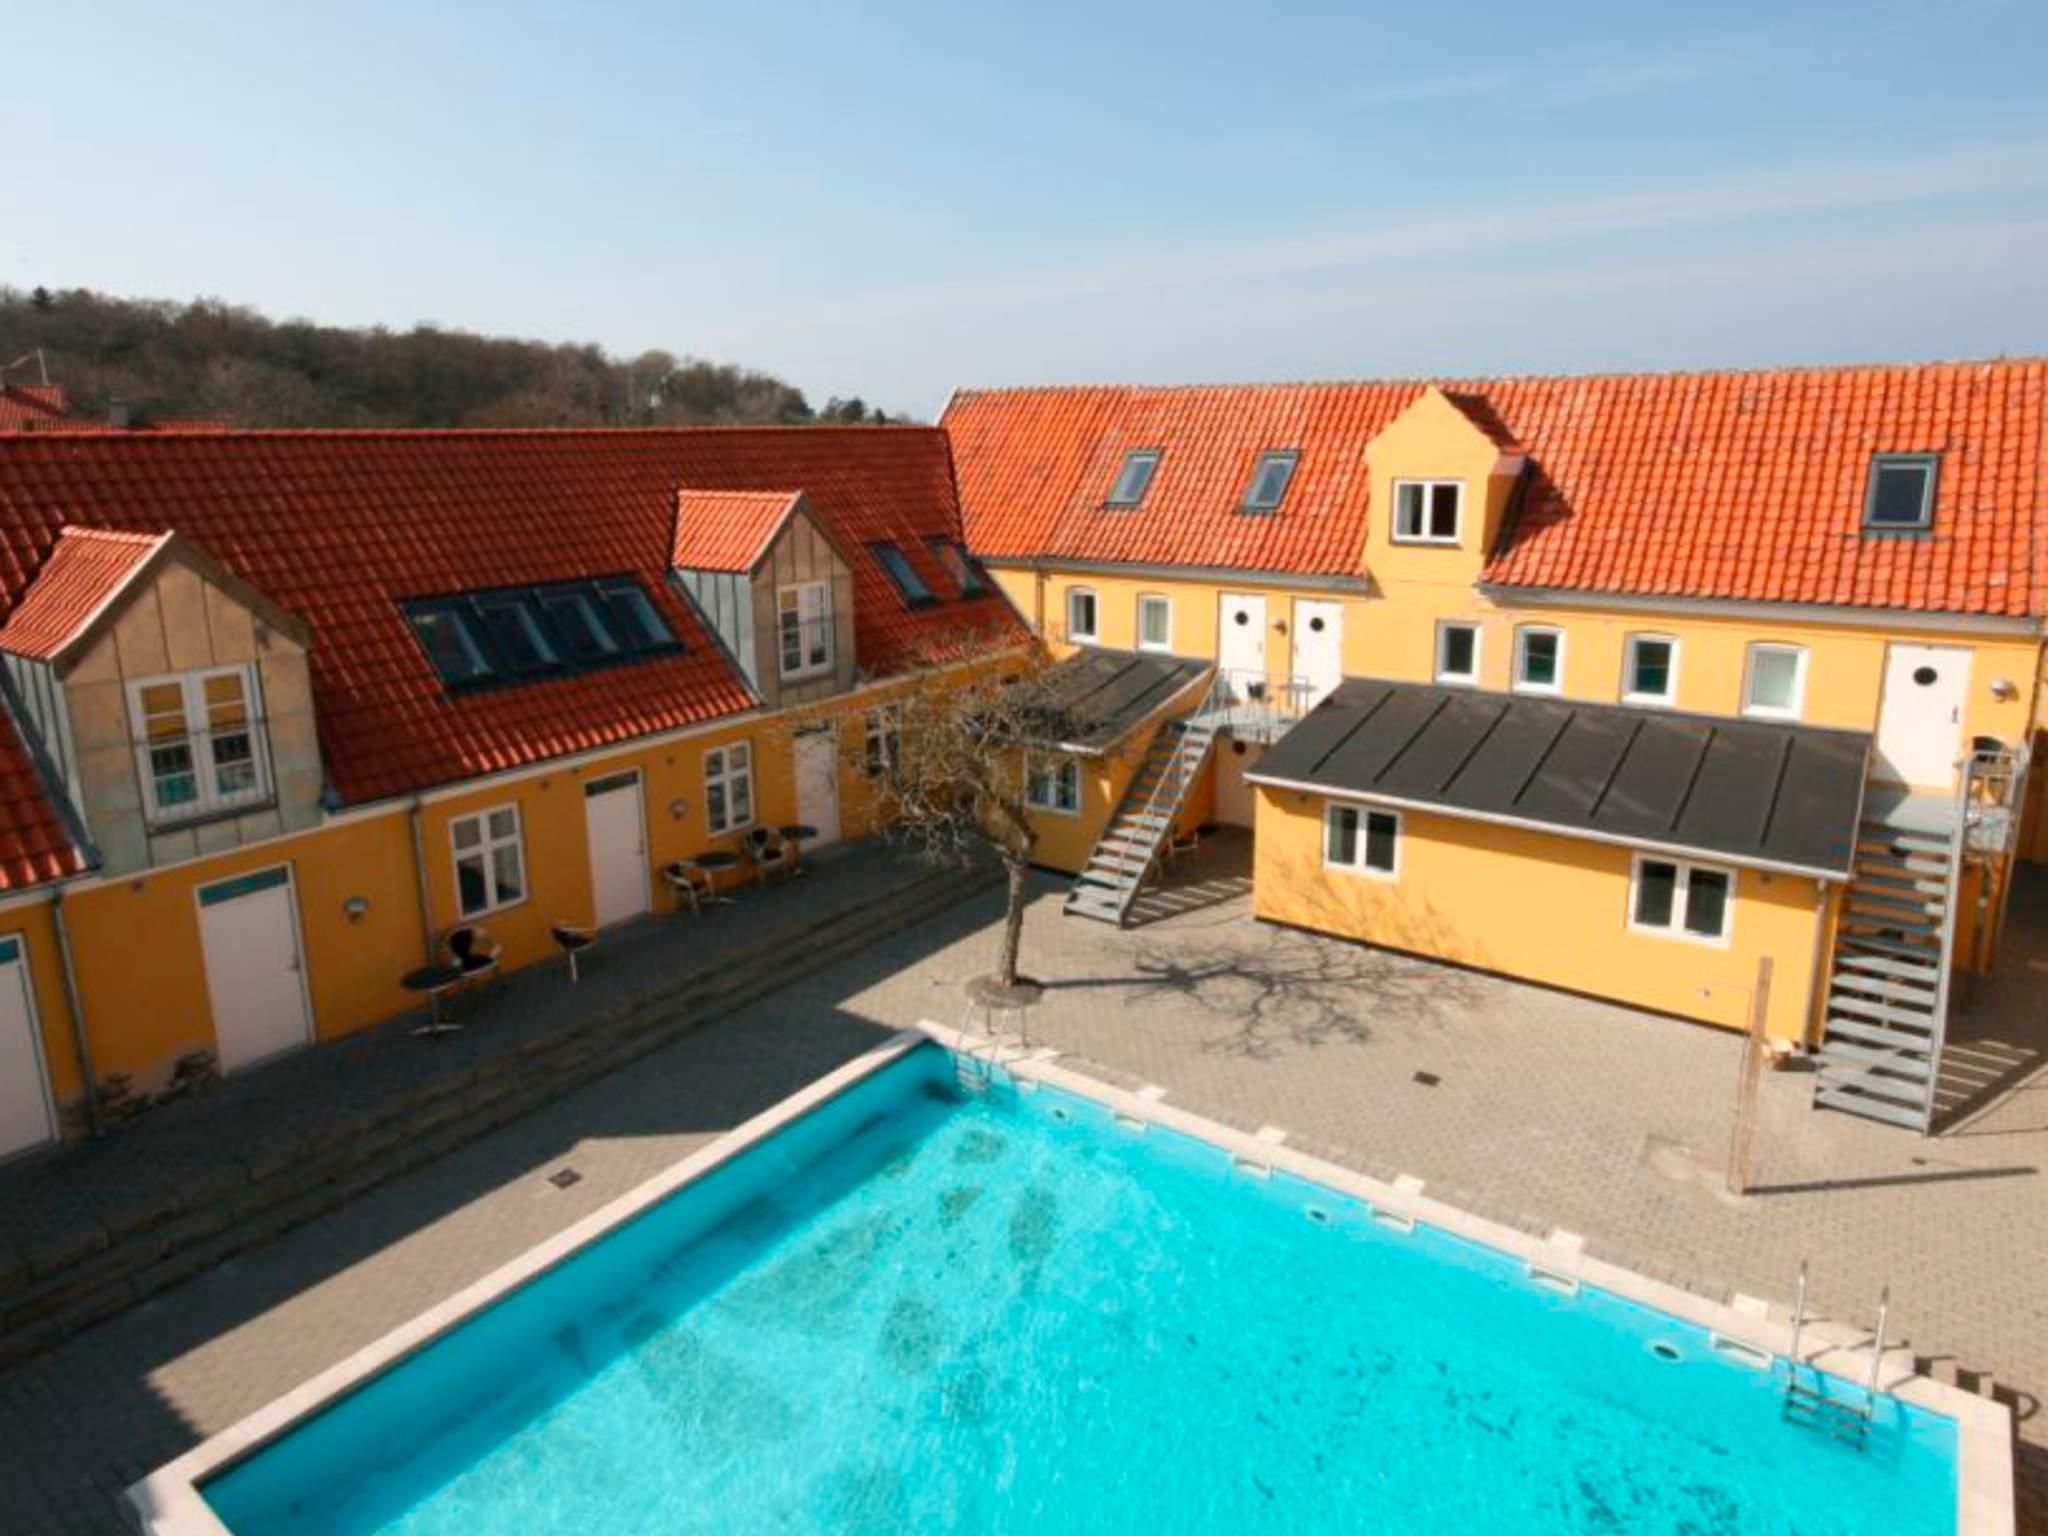 Ferienwohnung Gudhjem (135425), Gudhjem, , Bornholm, Dänemark, Bild 13